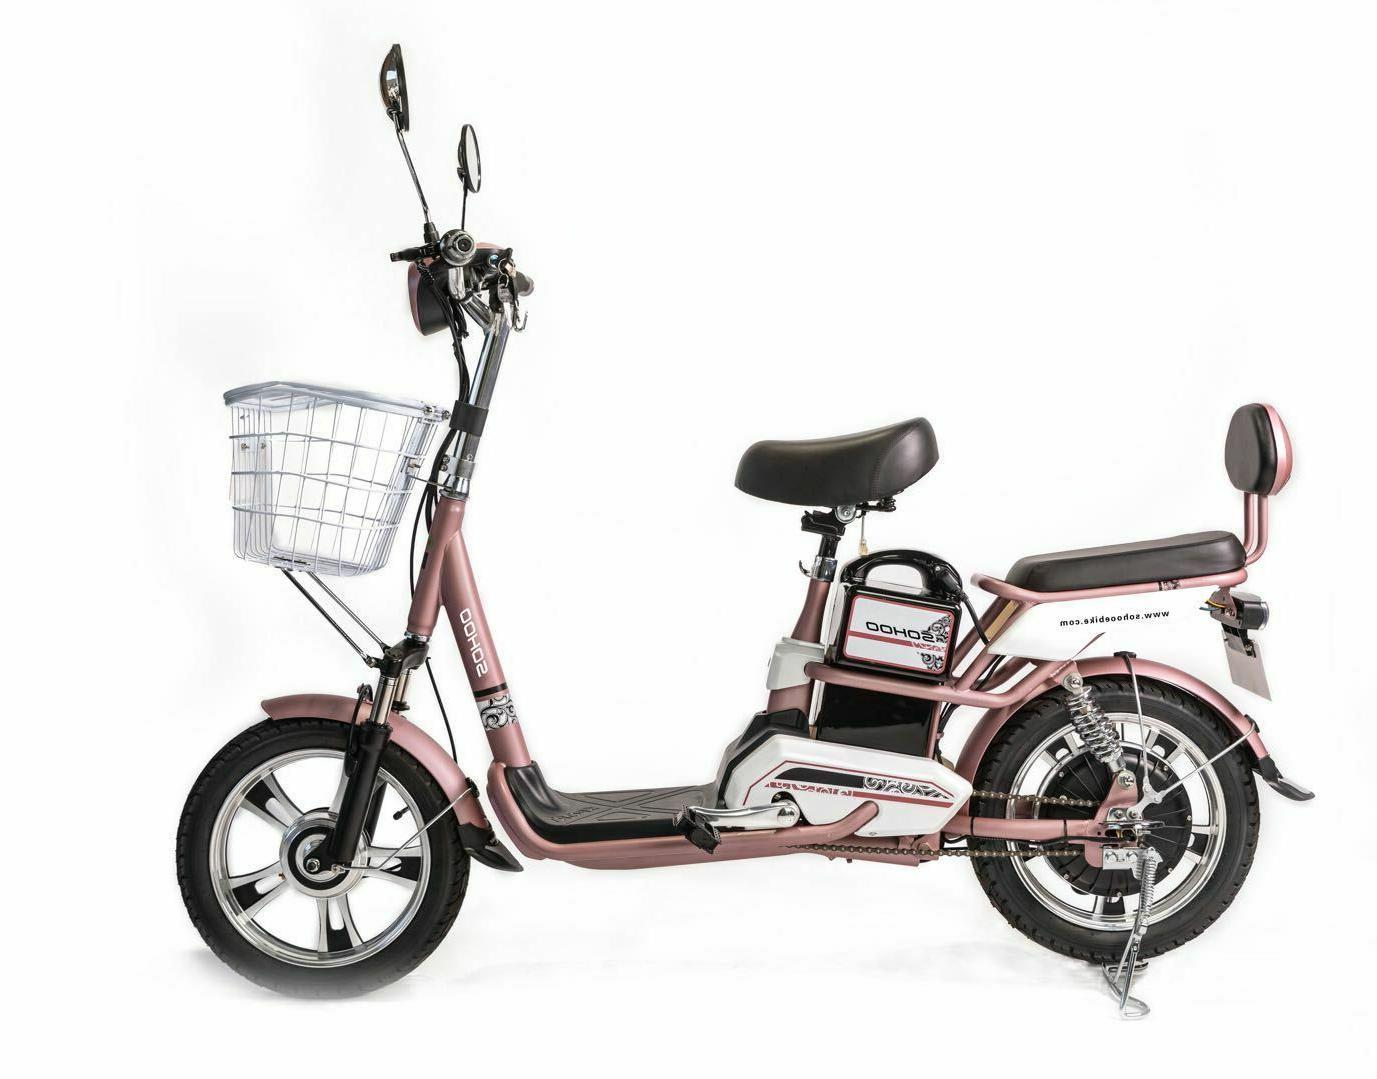 SOHOO Scooter City E-Bike E-Scooter